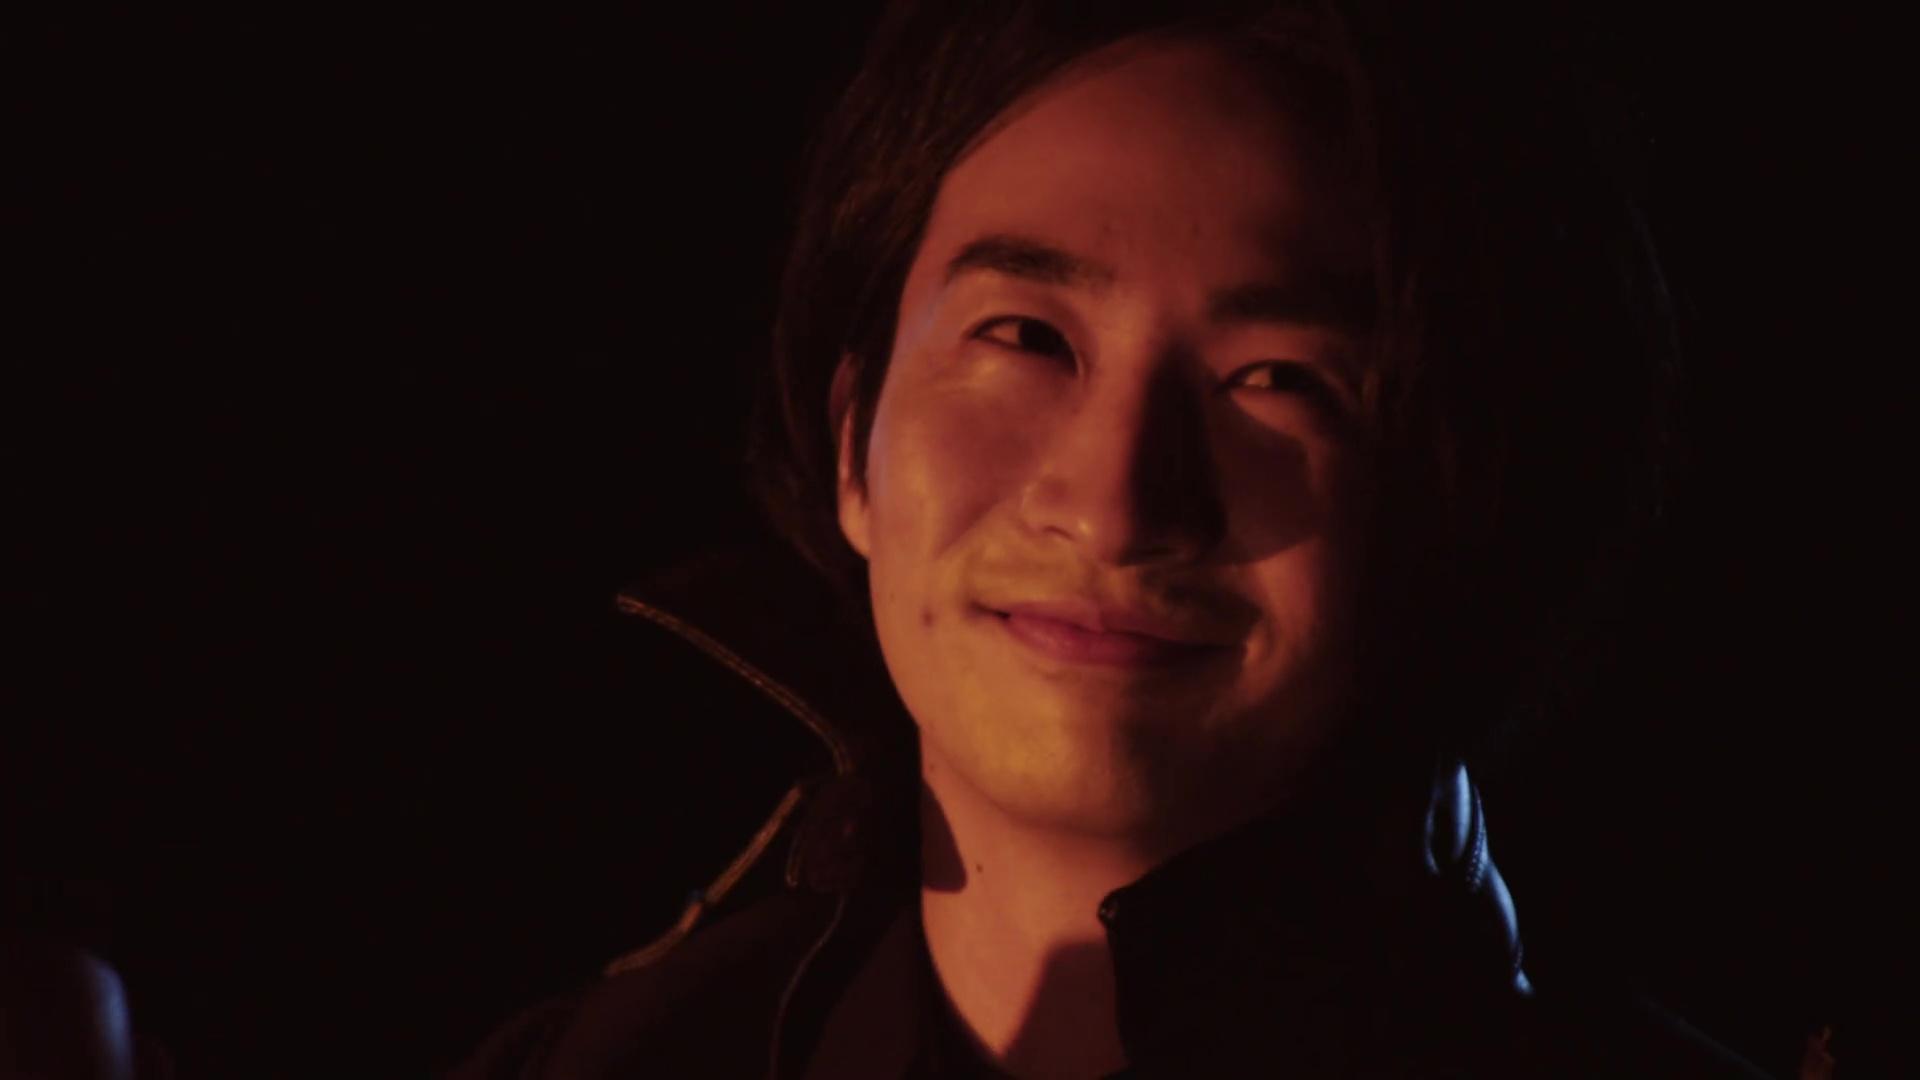 Kamen Rider Saber Episode 41 Recap